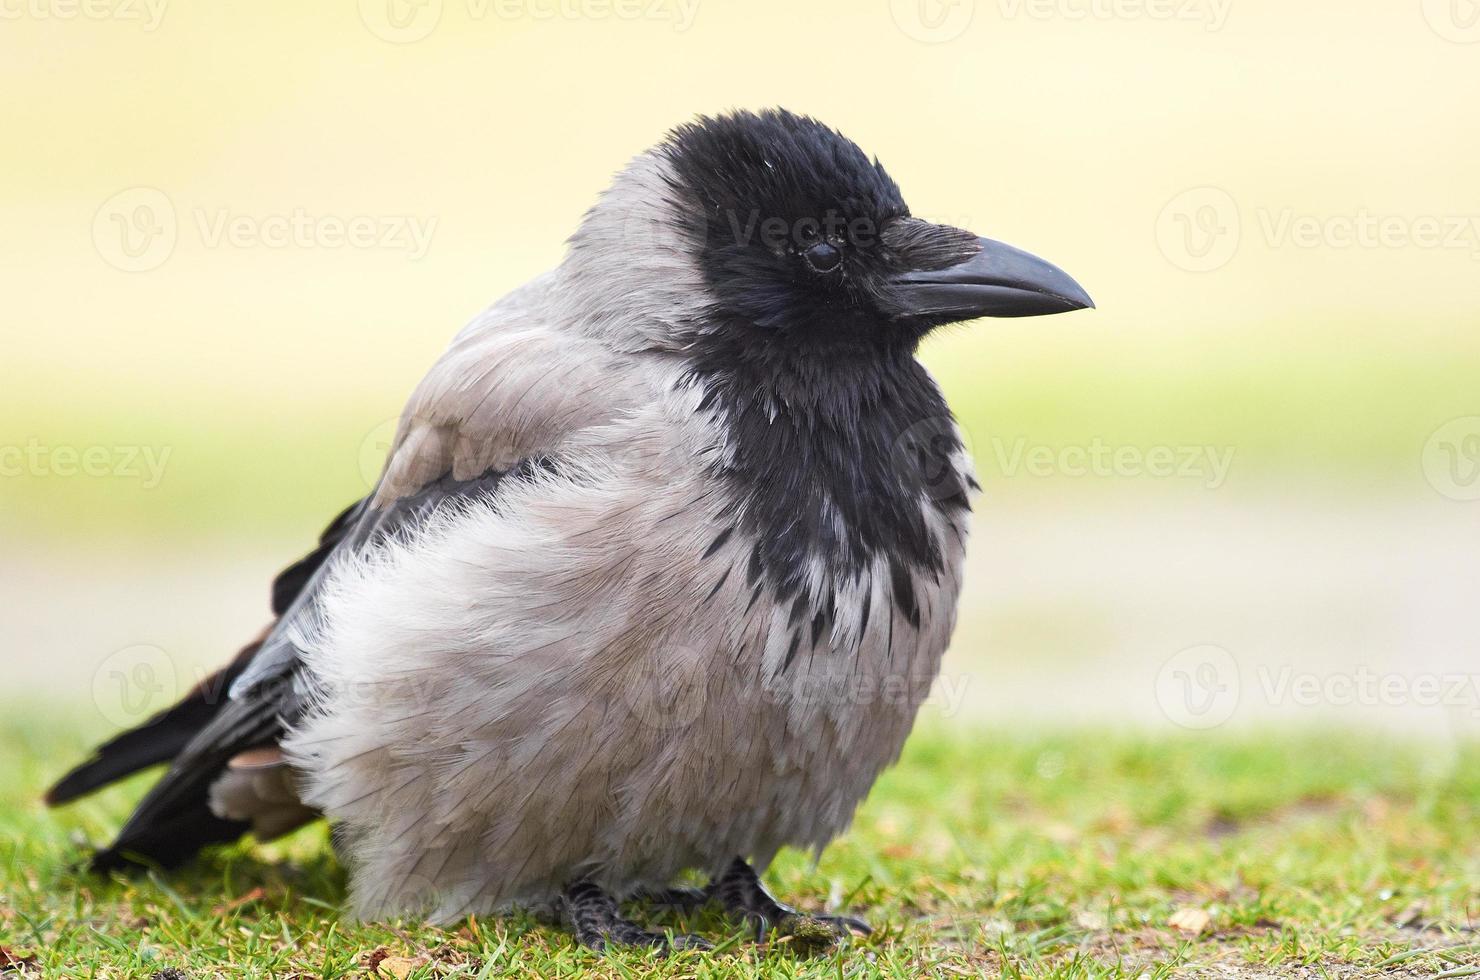 Hooded Crow (Corvus cornix) photo